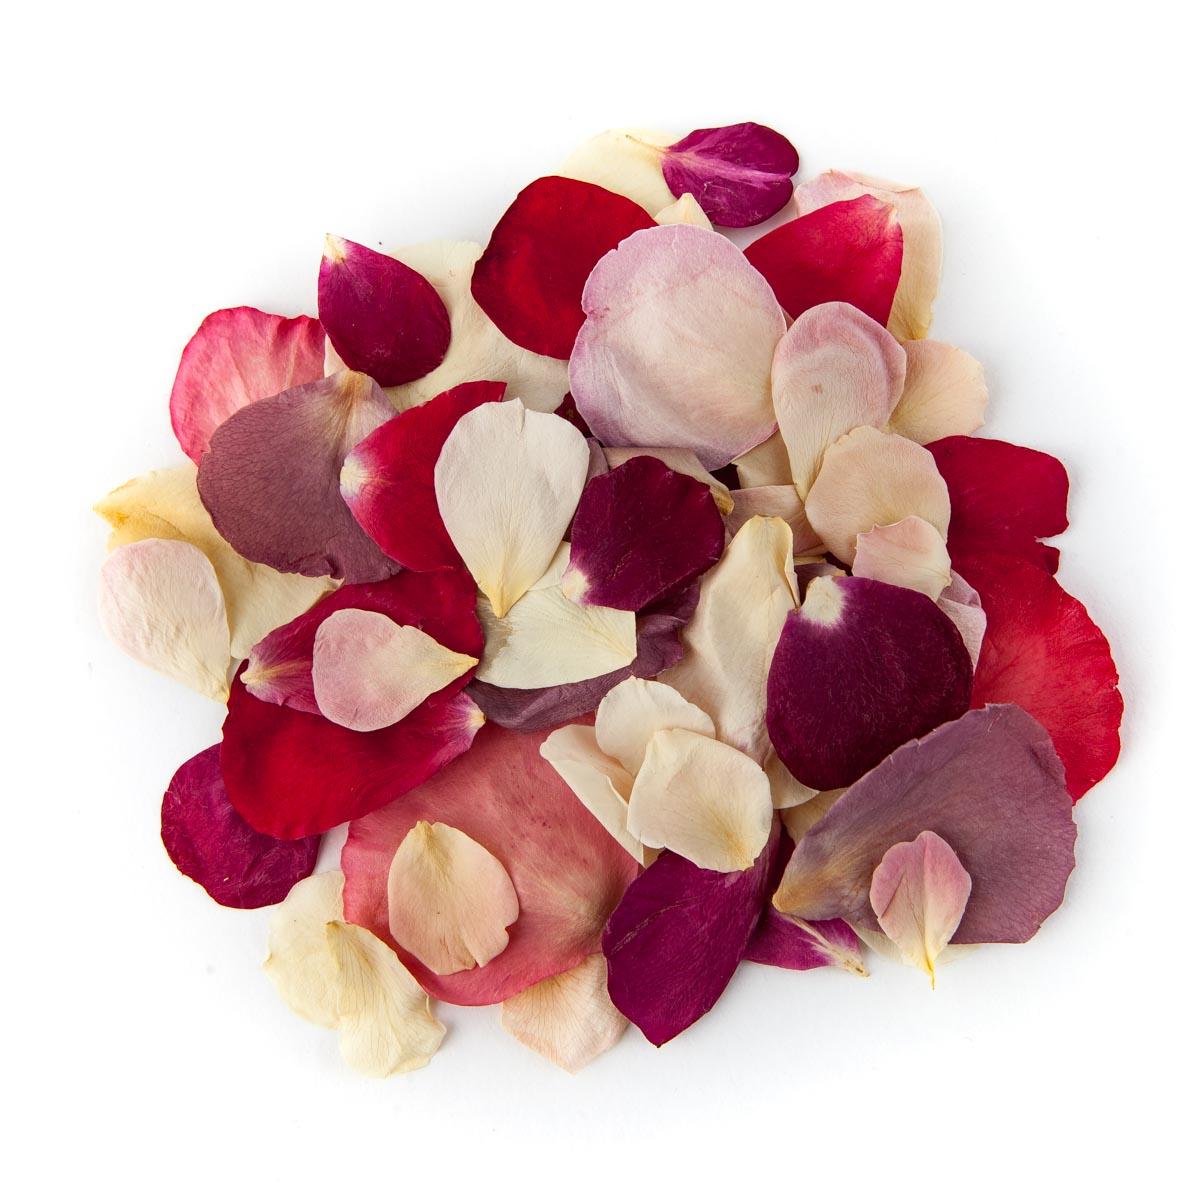 Rainbow Small Natural Rose Petal Confetti